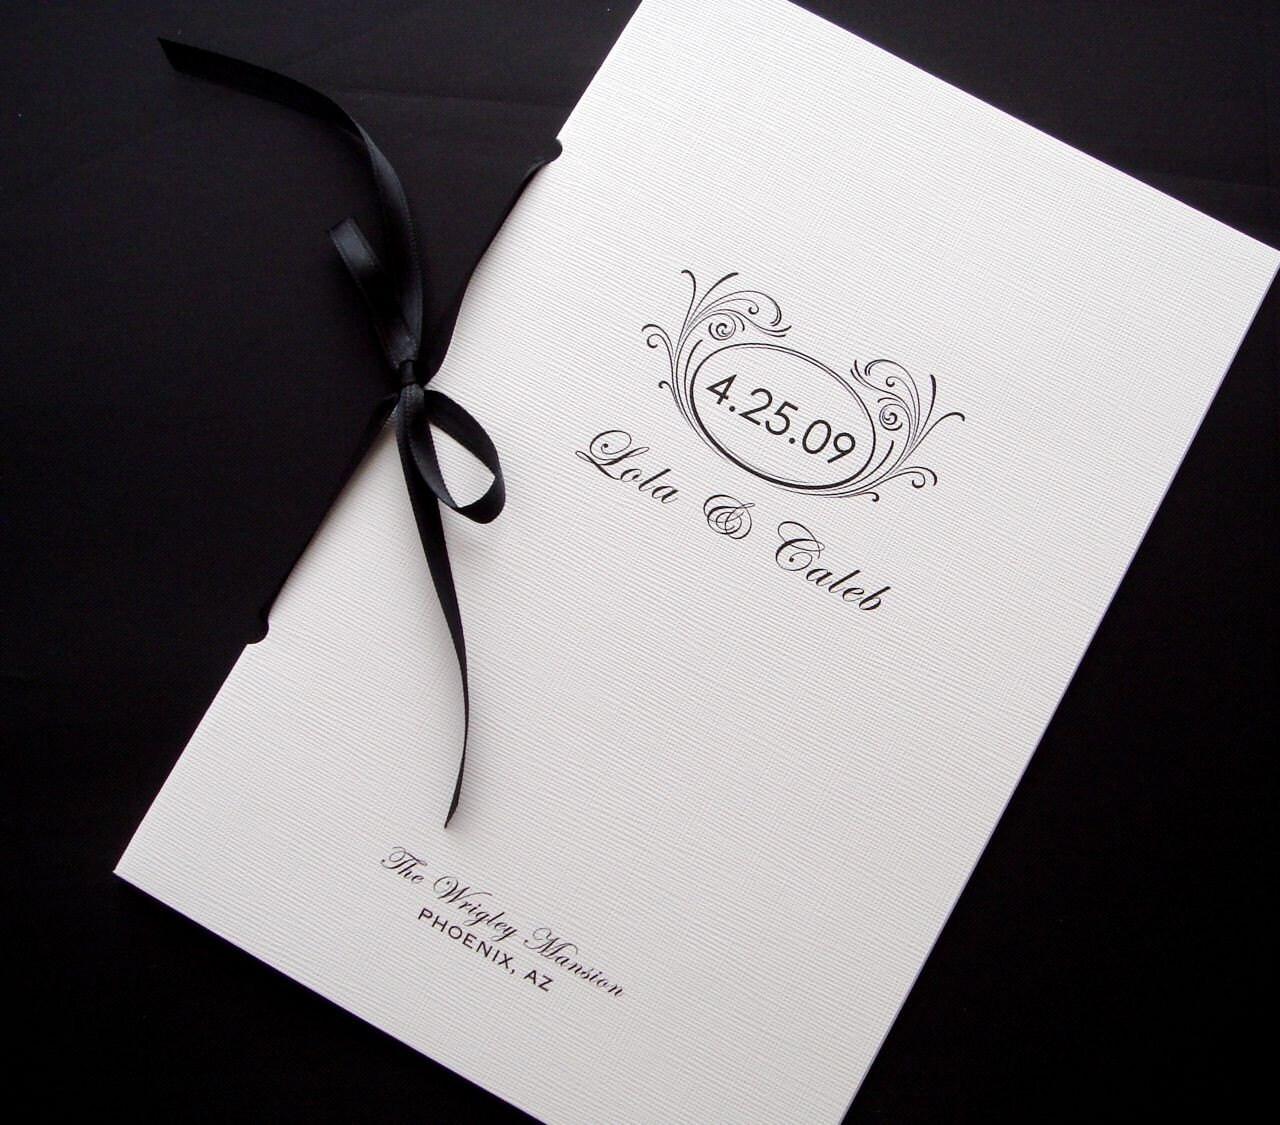 catholic wedding program cover sendafax090111nのブログ